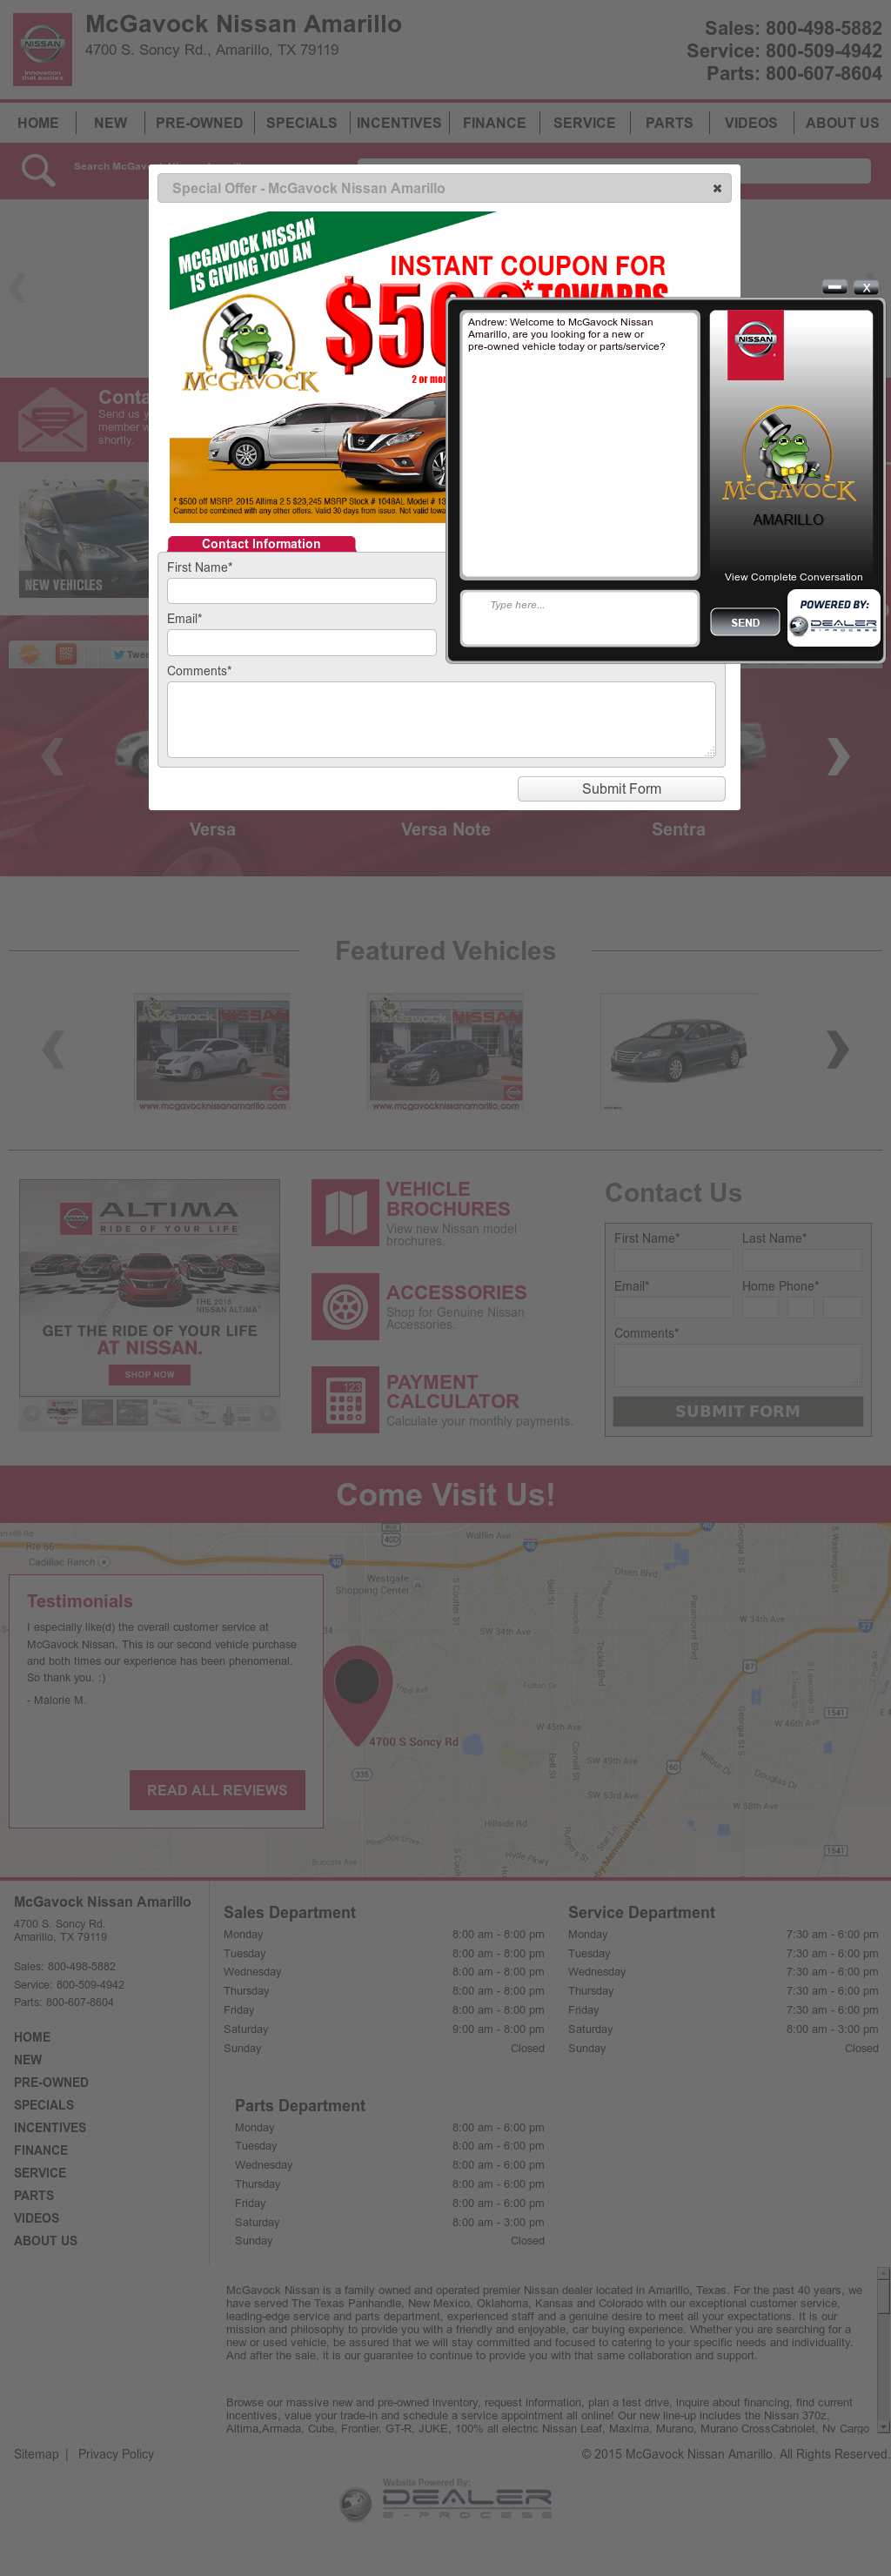 Mcgavock Nissan Amarillo Competitors, Revenue And Employees   Owler Company  Profile